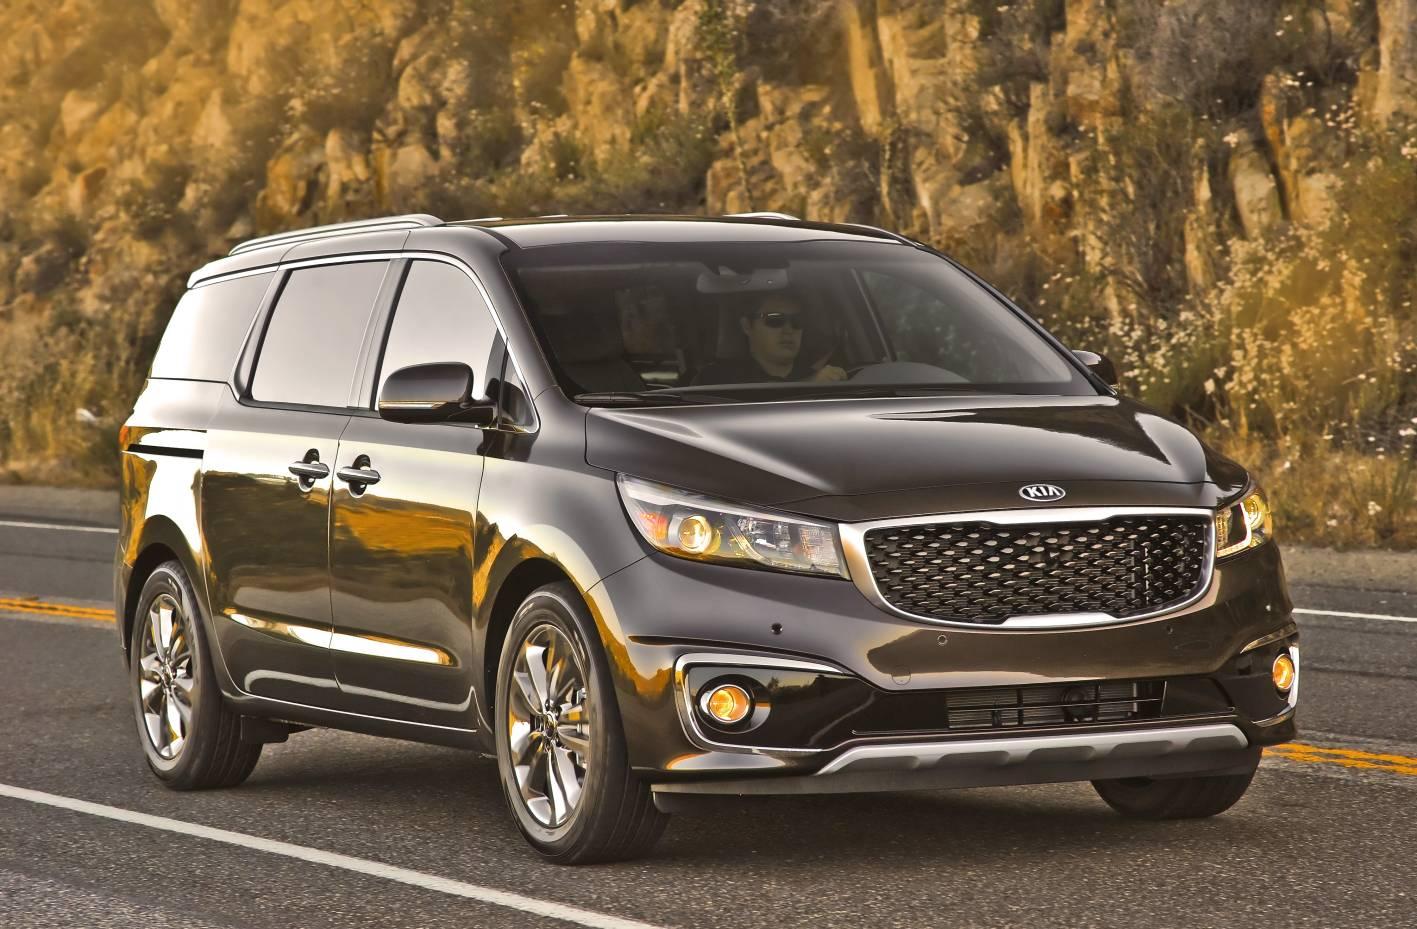 Five Star Hyundai >> News - Maximum Five-Star Safety Rating For Kia Carnival